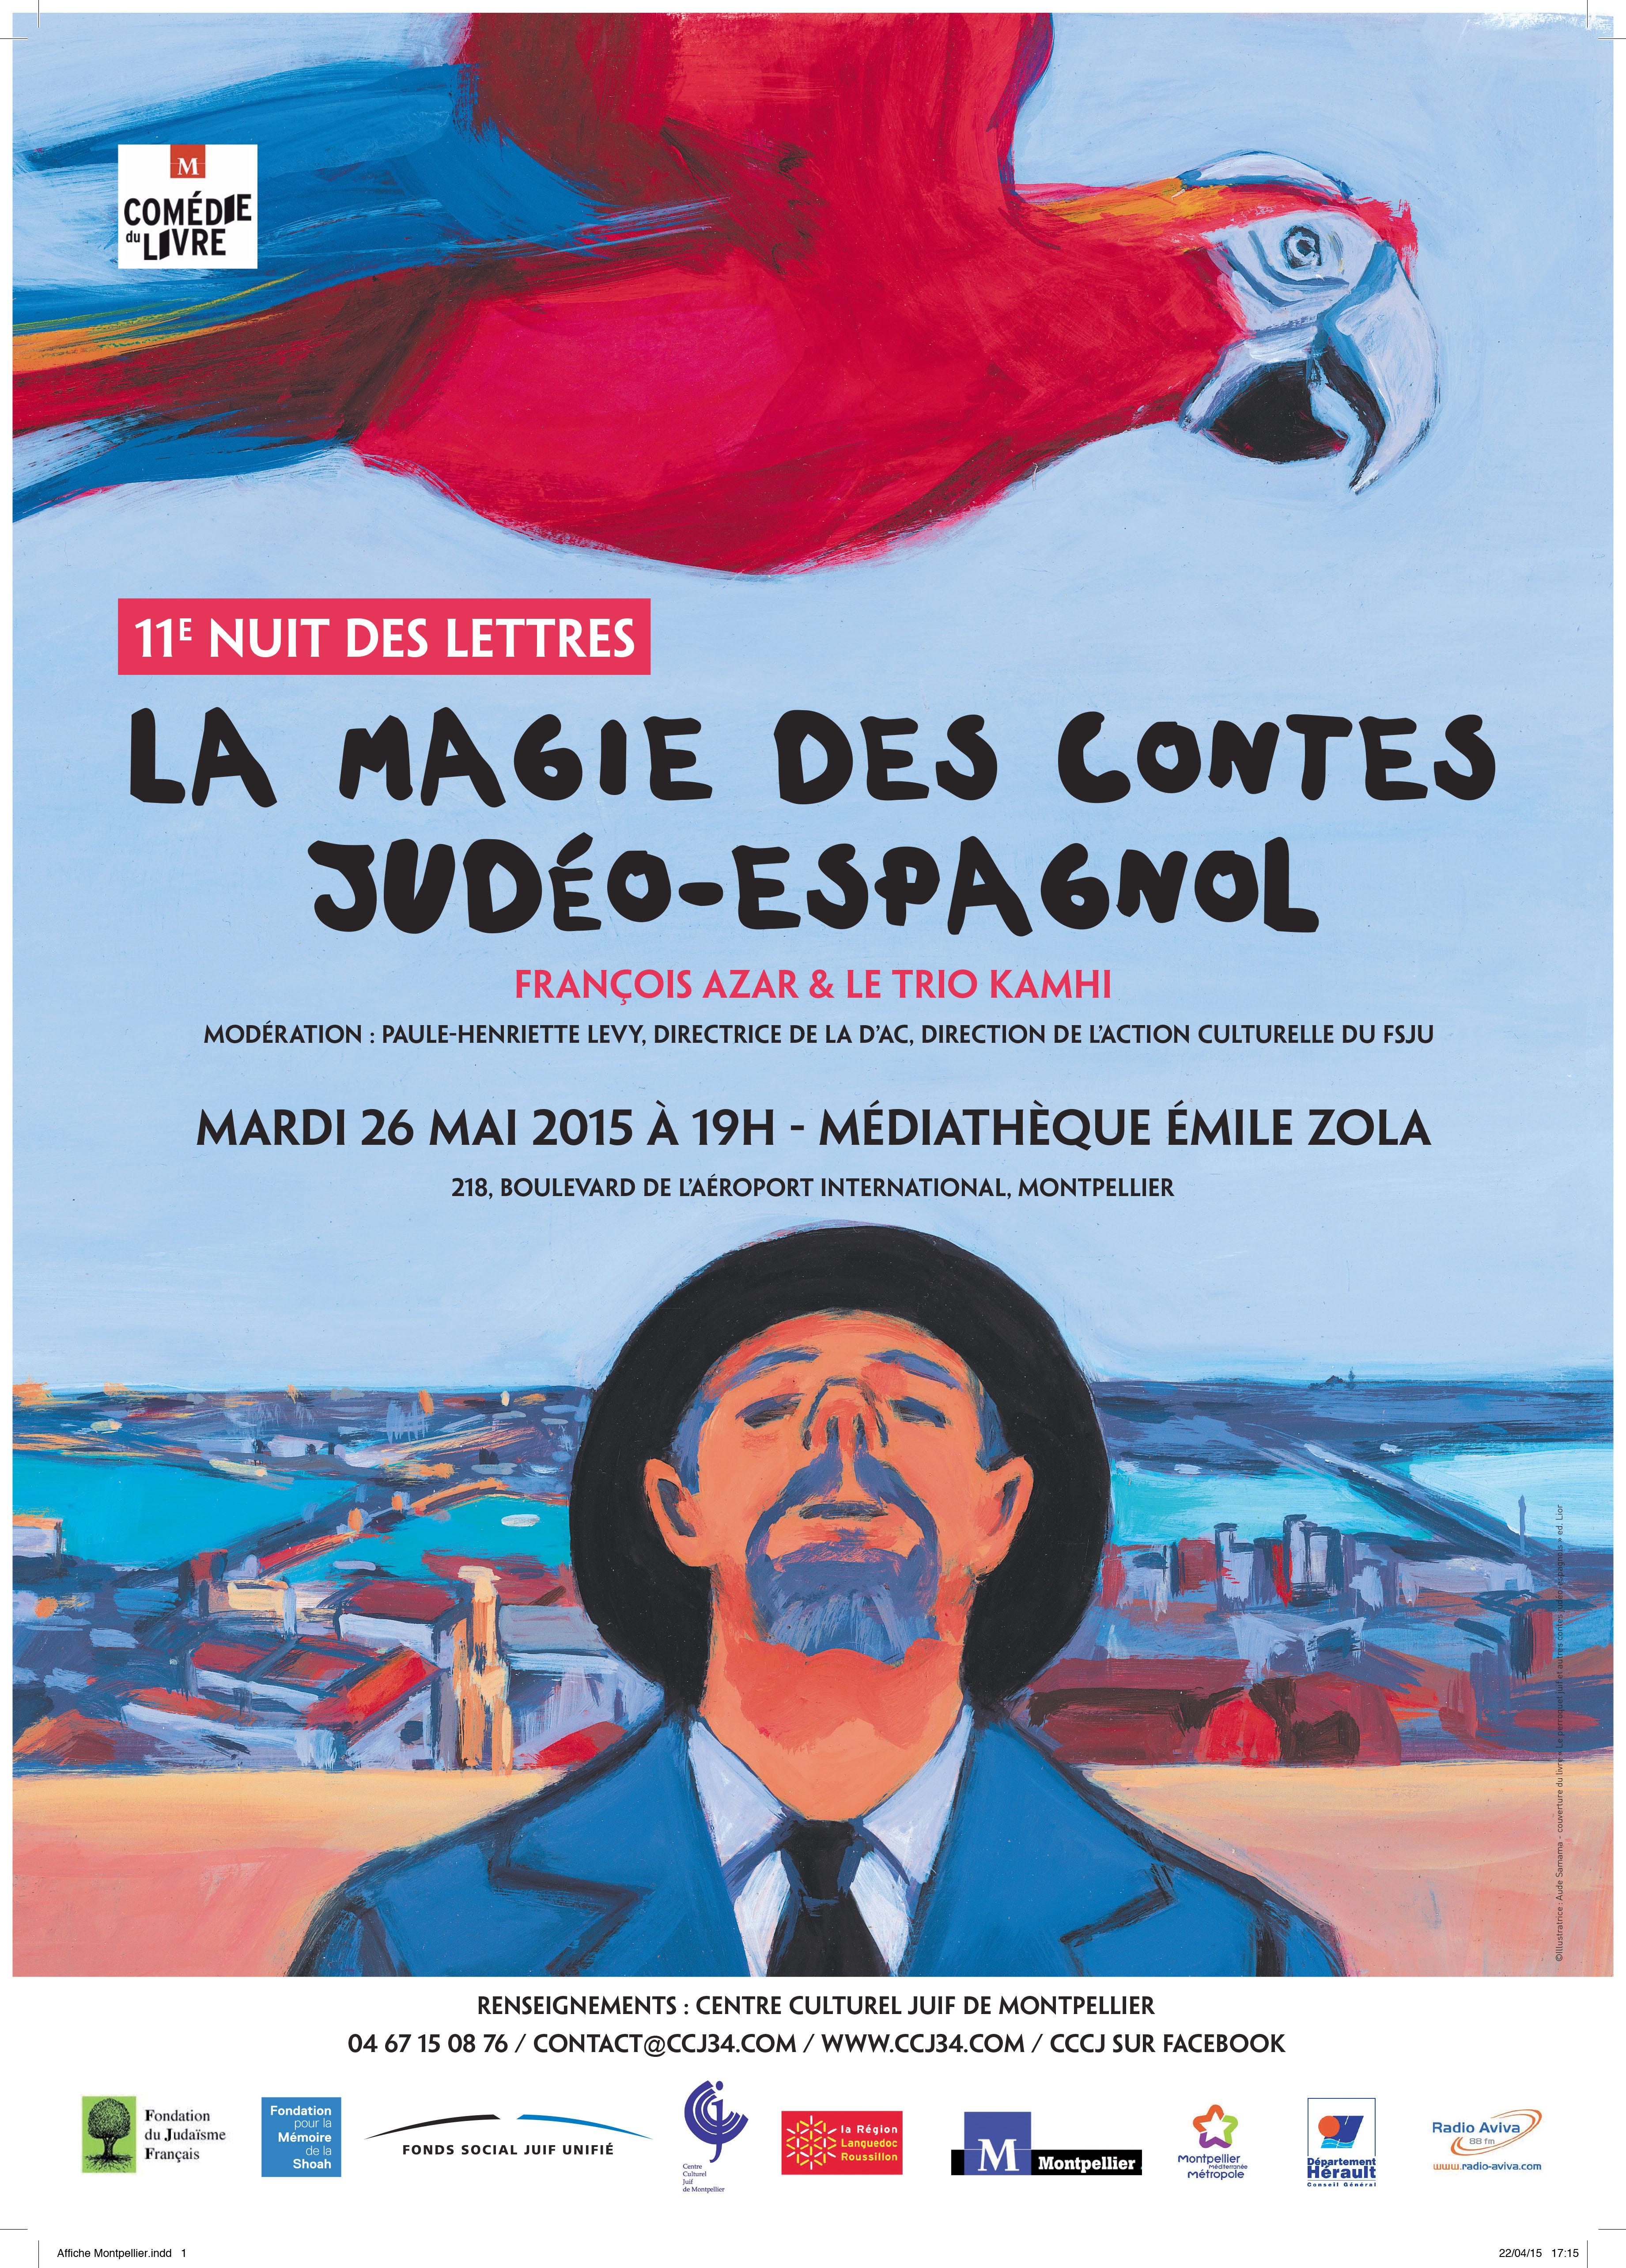 La magie des contes judéo-espagnols